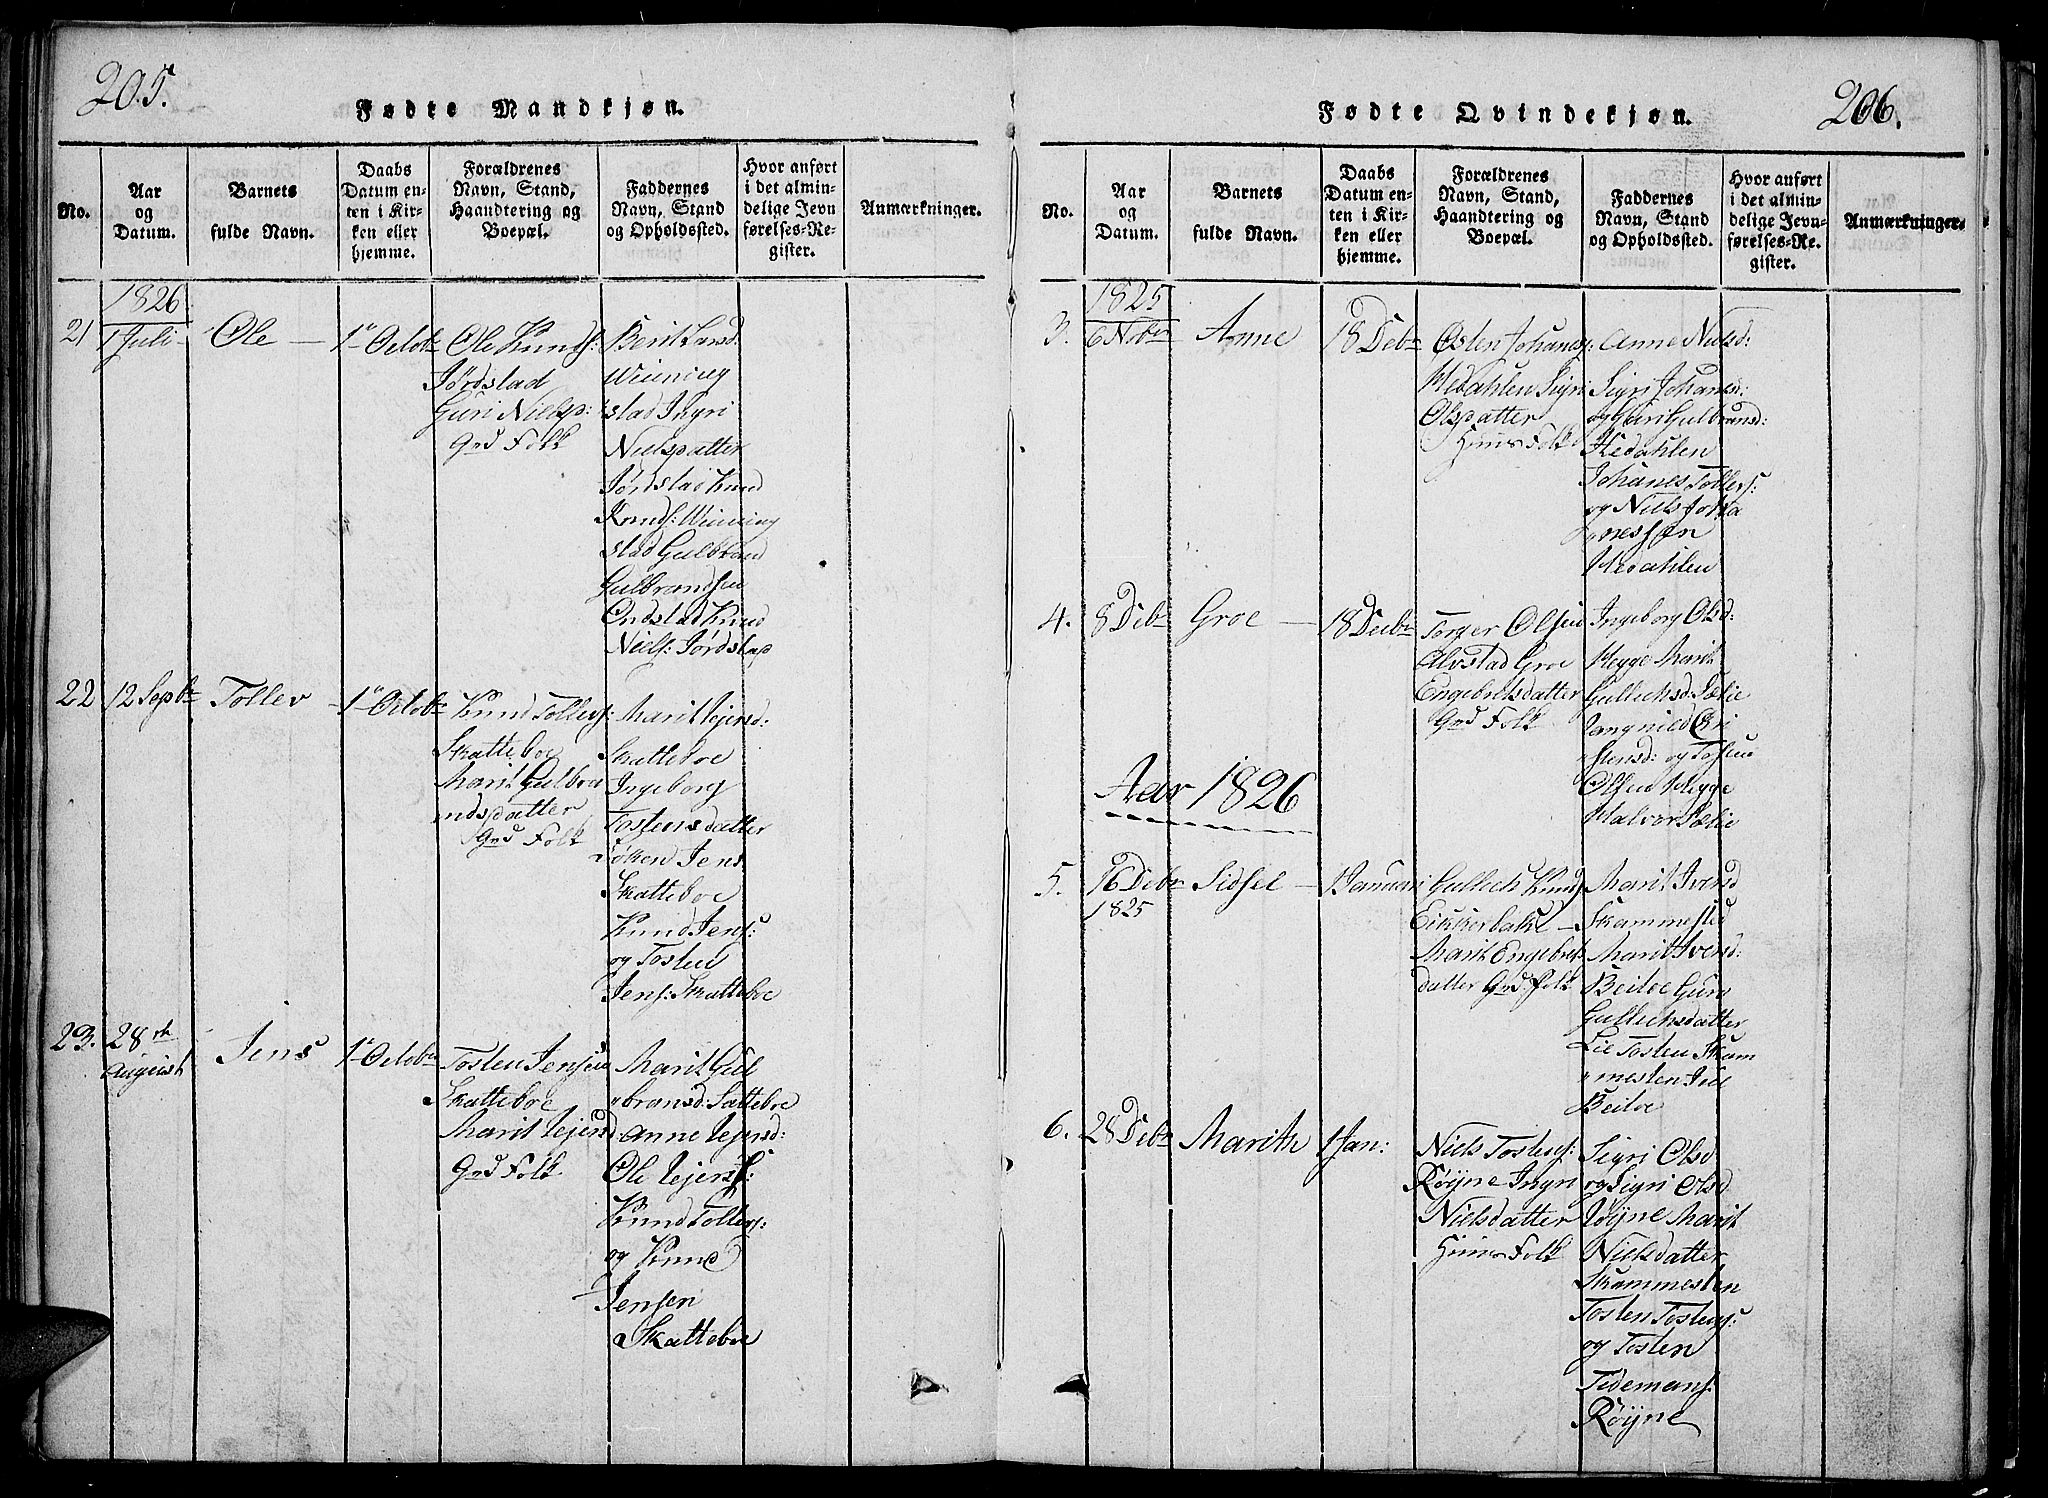 SAH, Slidre prestekontor, Klokkerbok nr. 2, 1814-1839, s. 205-206